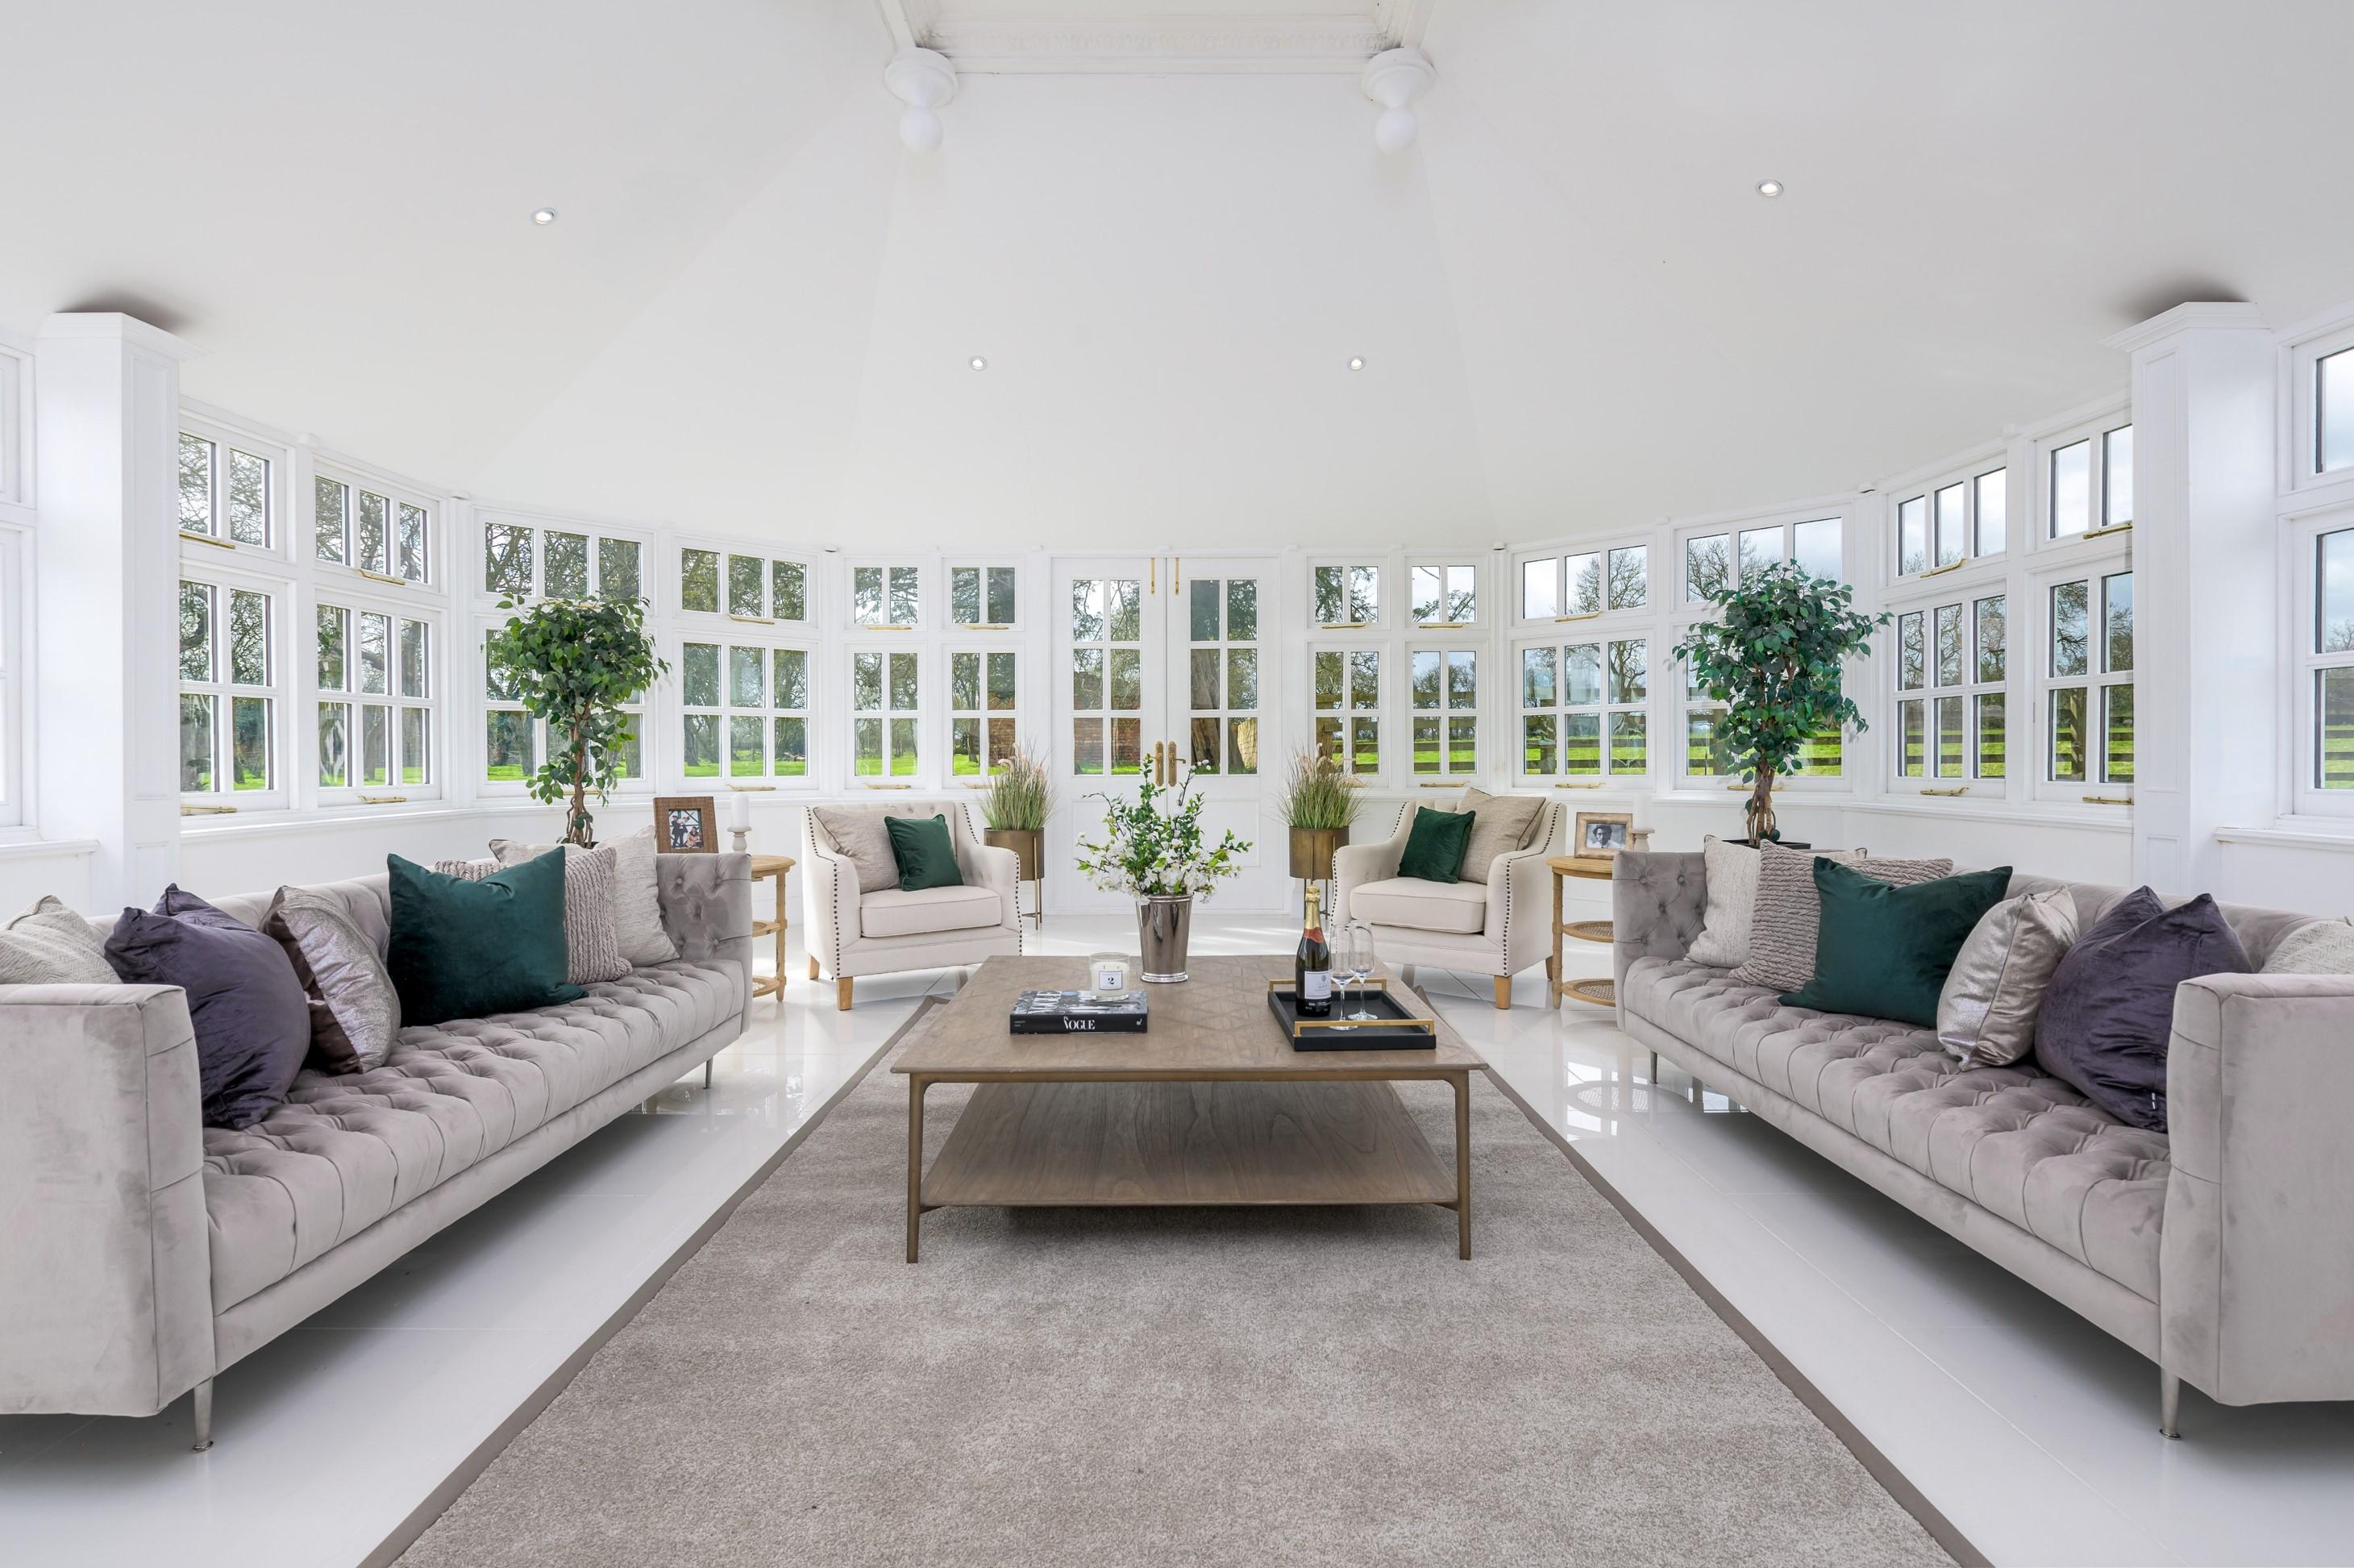 contemporary interior design before after garden room